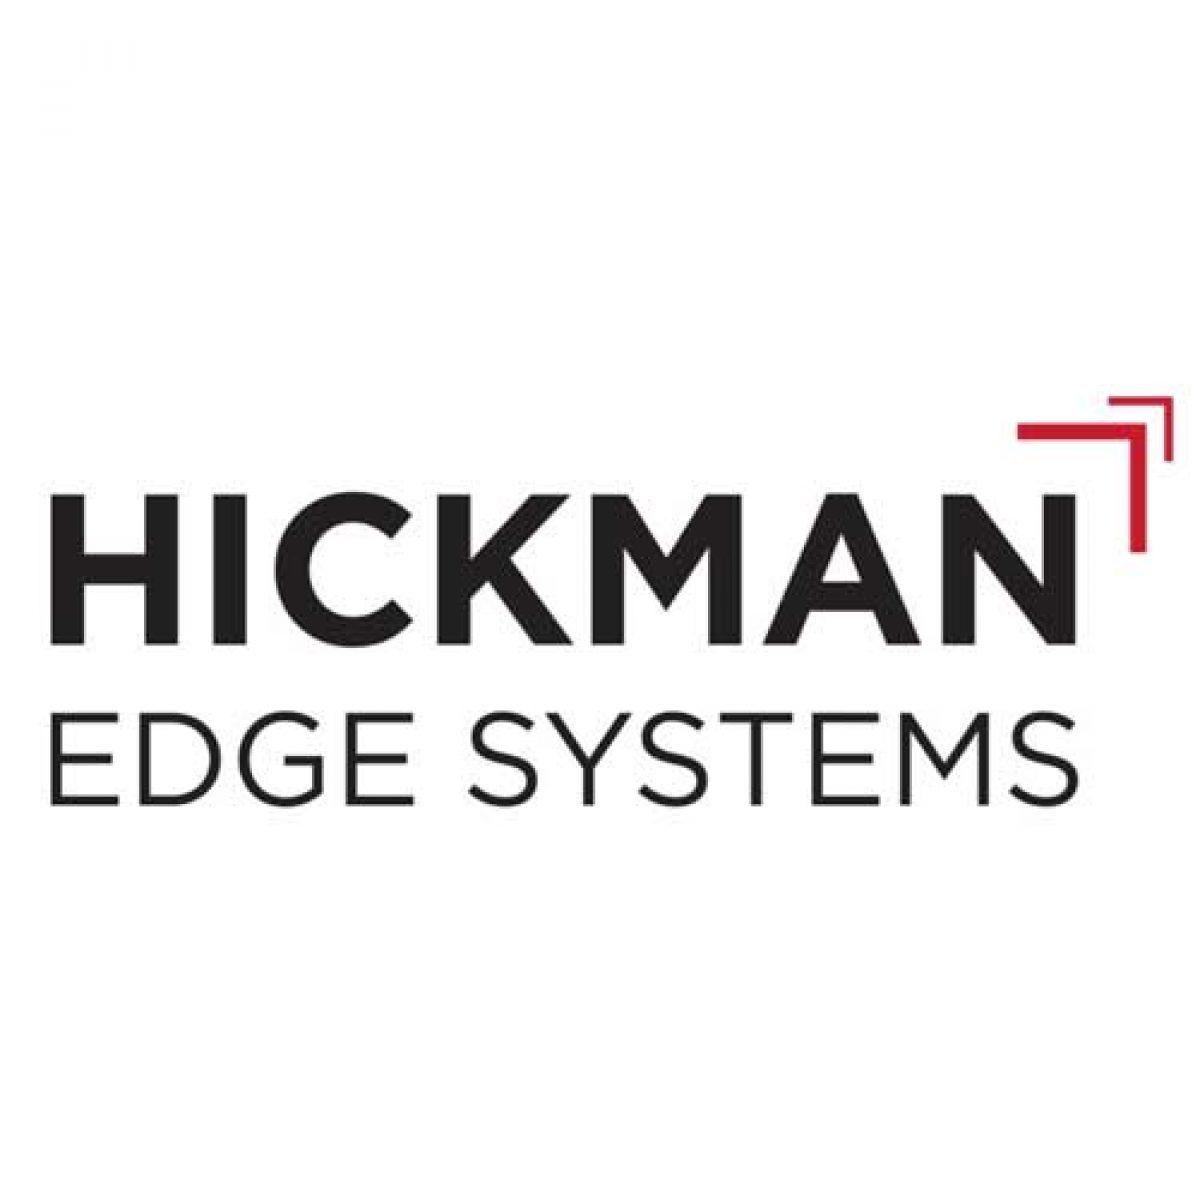 congress associates hickman